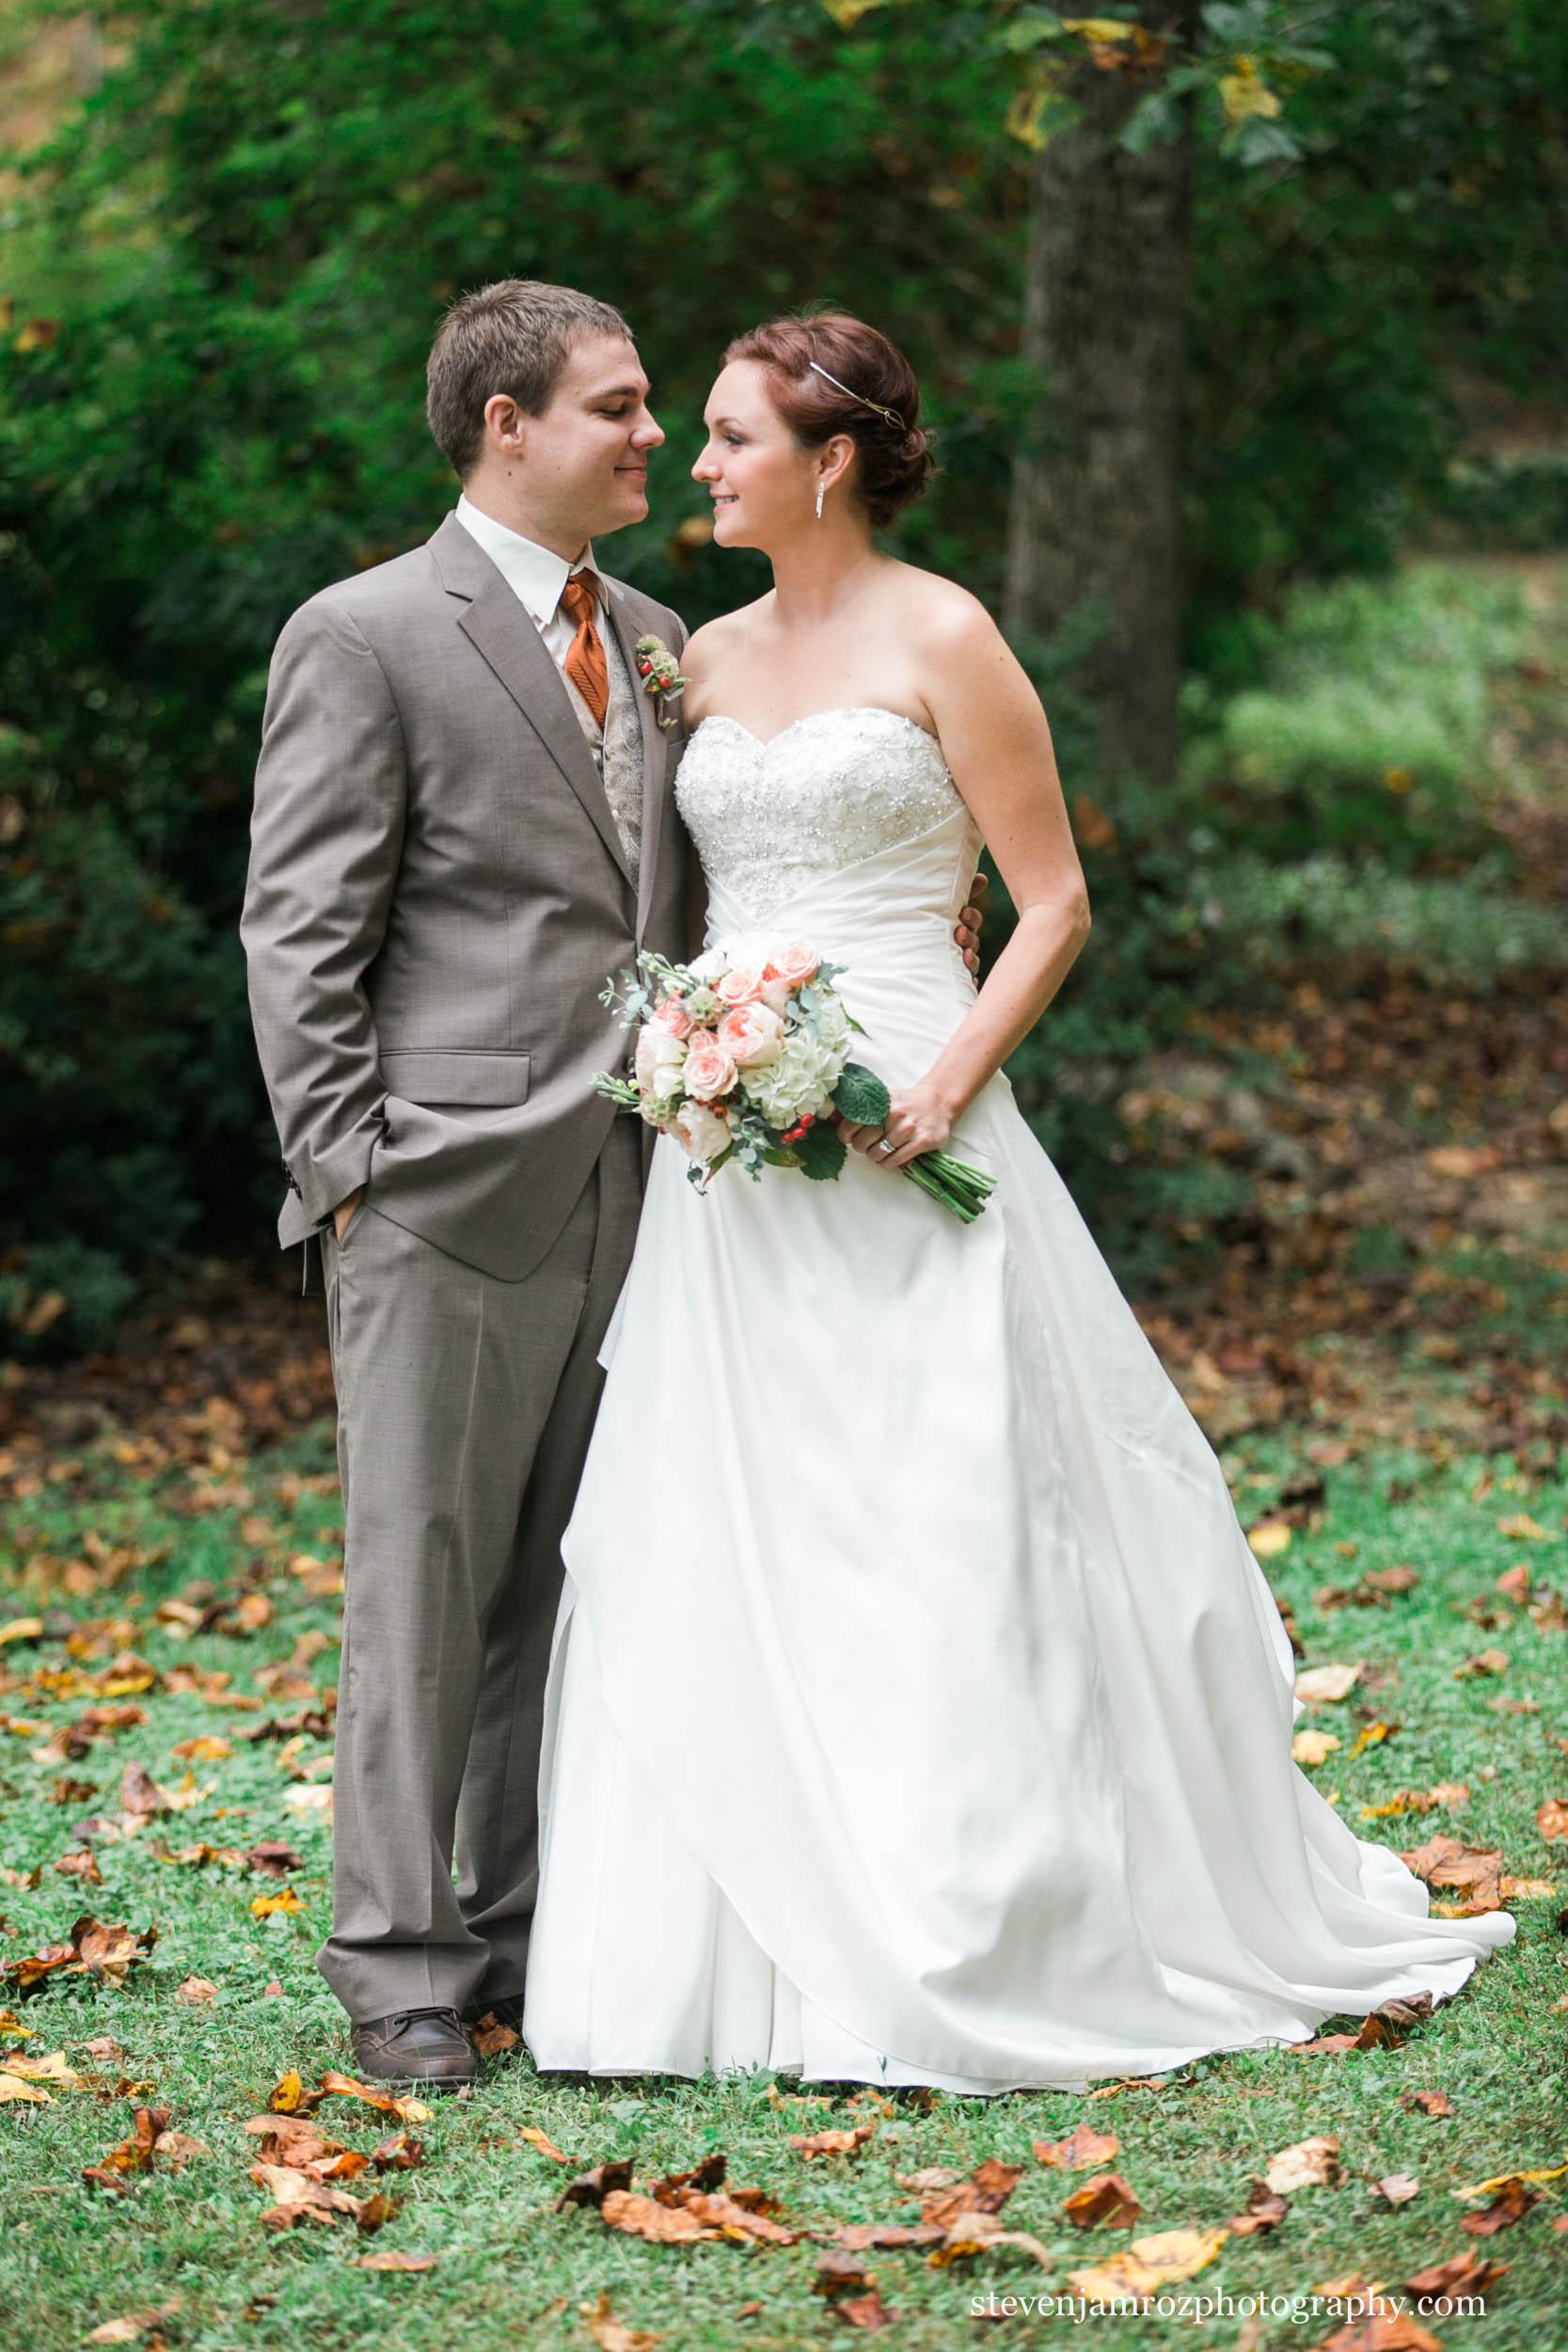 fall-colors-wedding-raleigh-nc-steven-jamroz-photography-0213.jpg